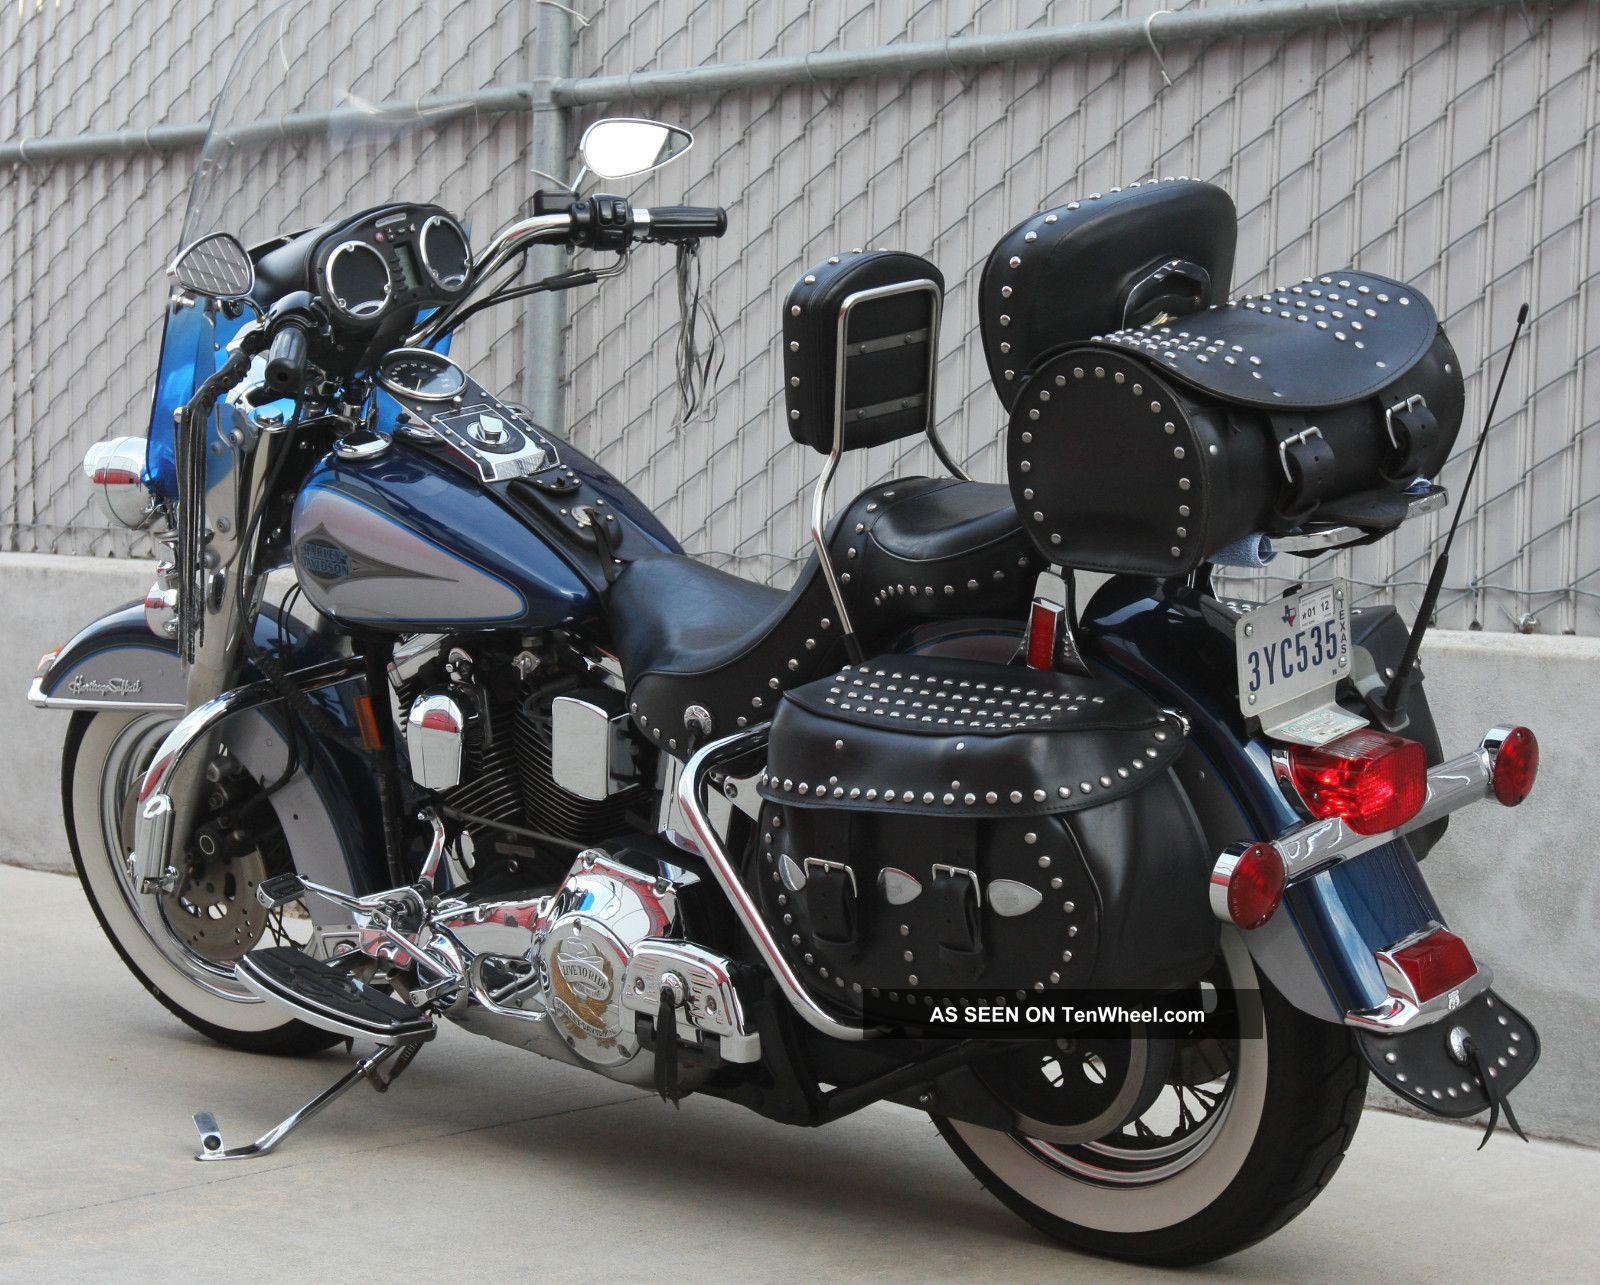 1999 Harley Davidson Flstc Heritage Softail Classic Clic